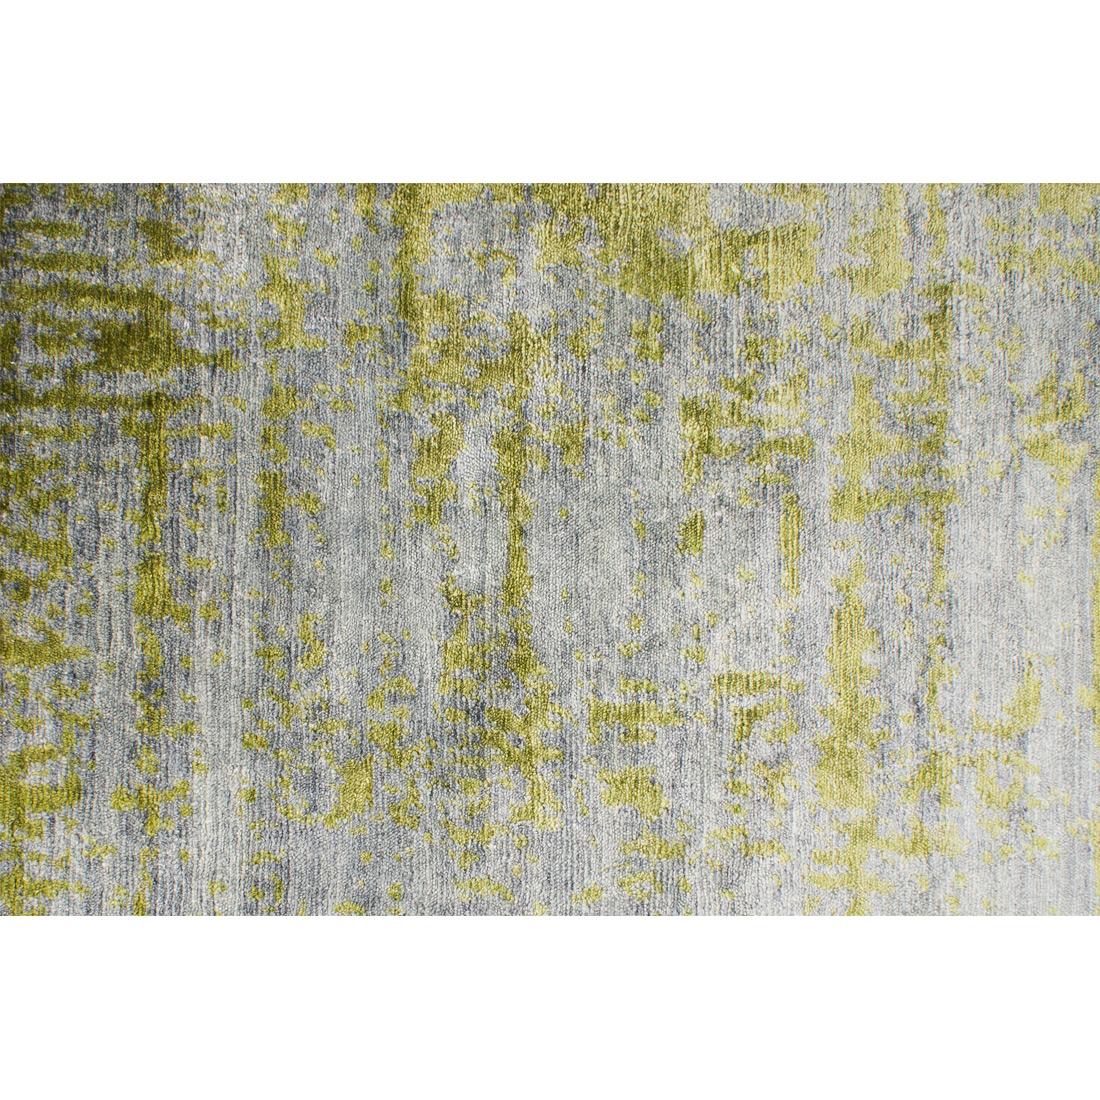 Vloerkleed Xilento Bamboo Grey Green | 200 x 300 cm